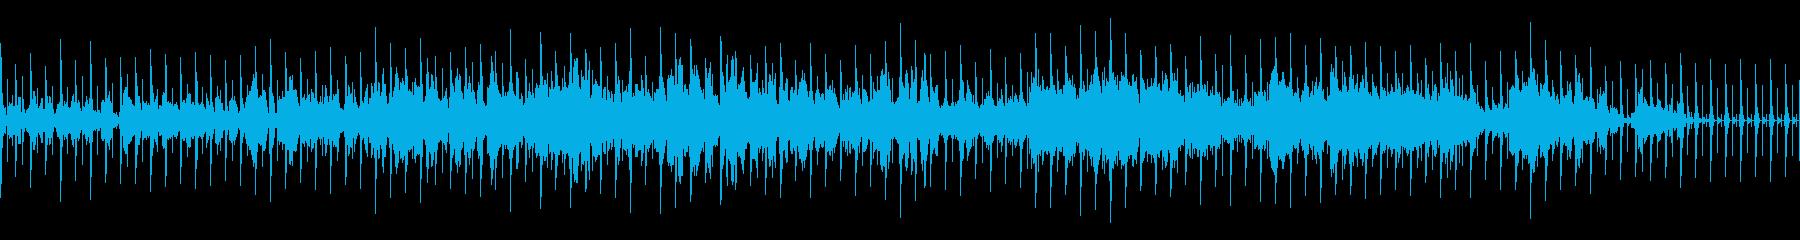 Vlog!おしゃれキラキラポップの再生済みの波形